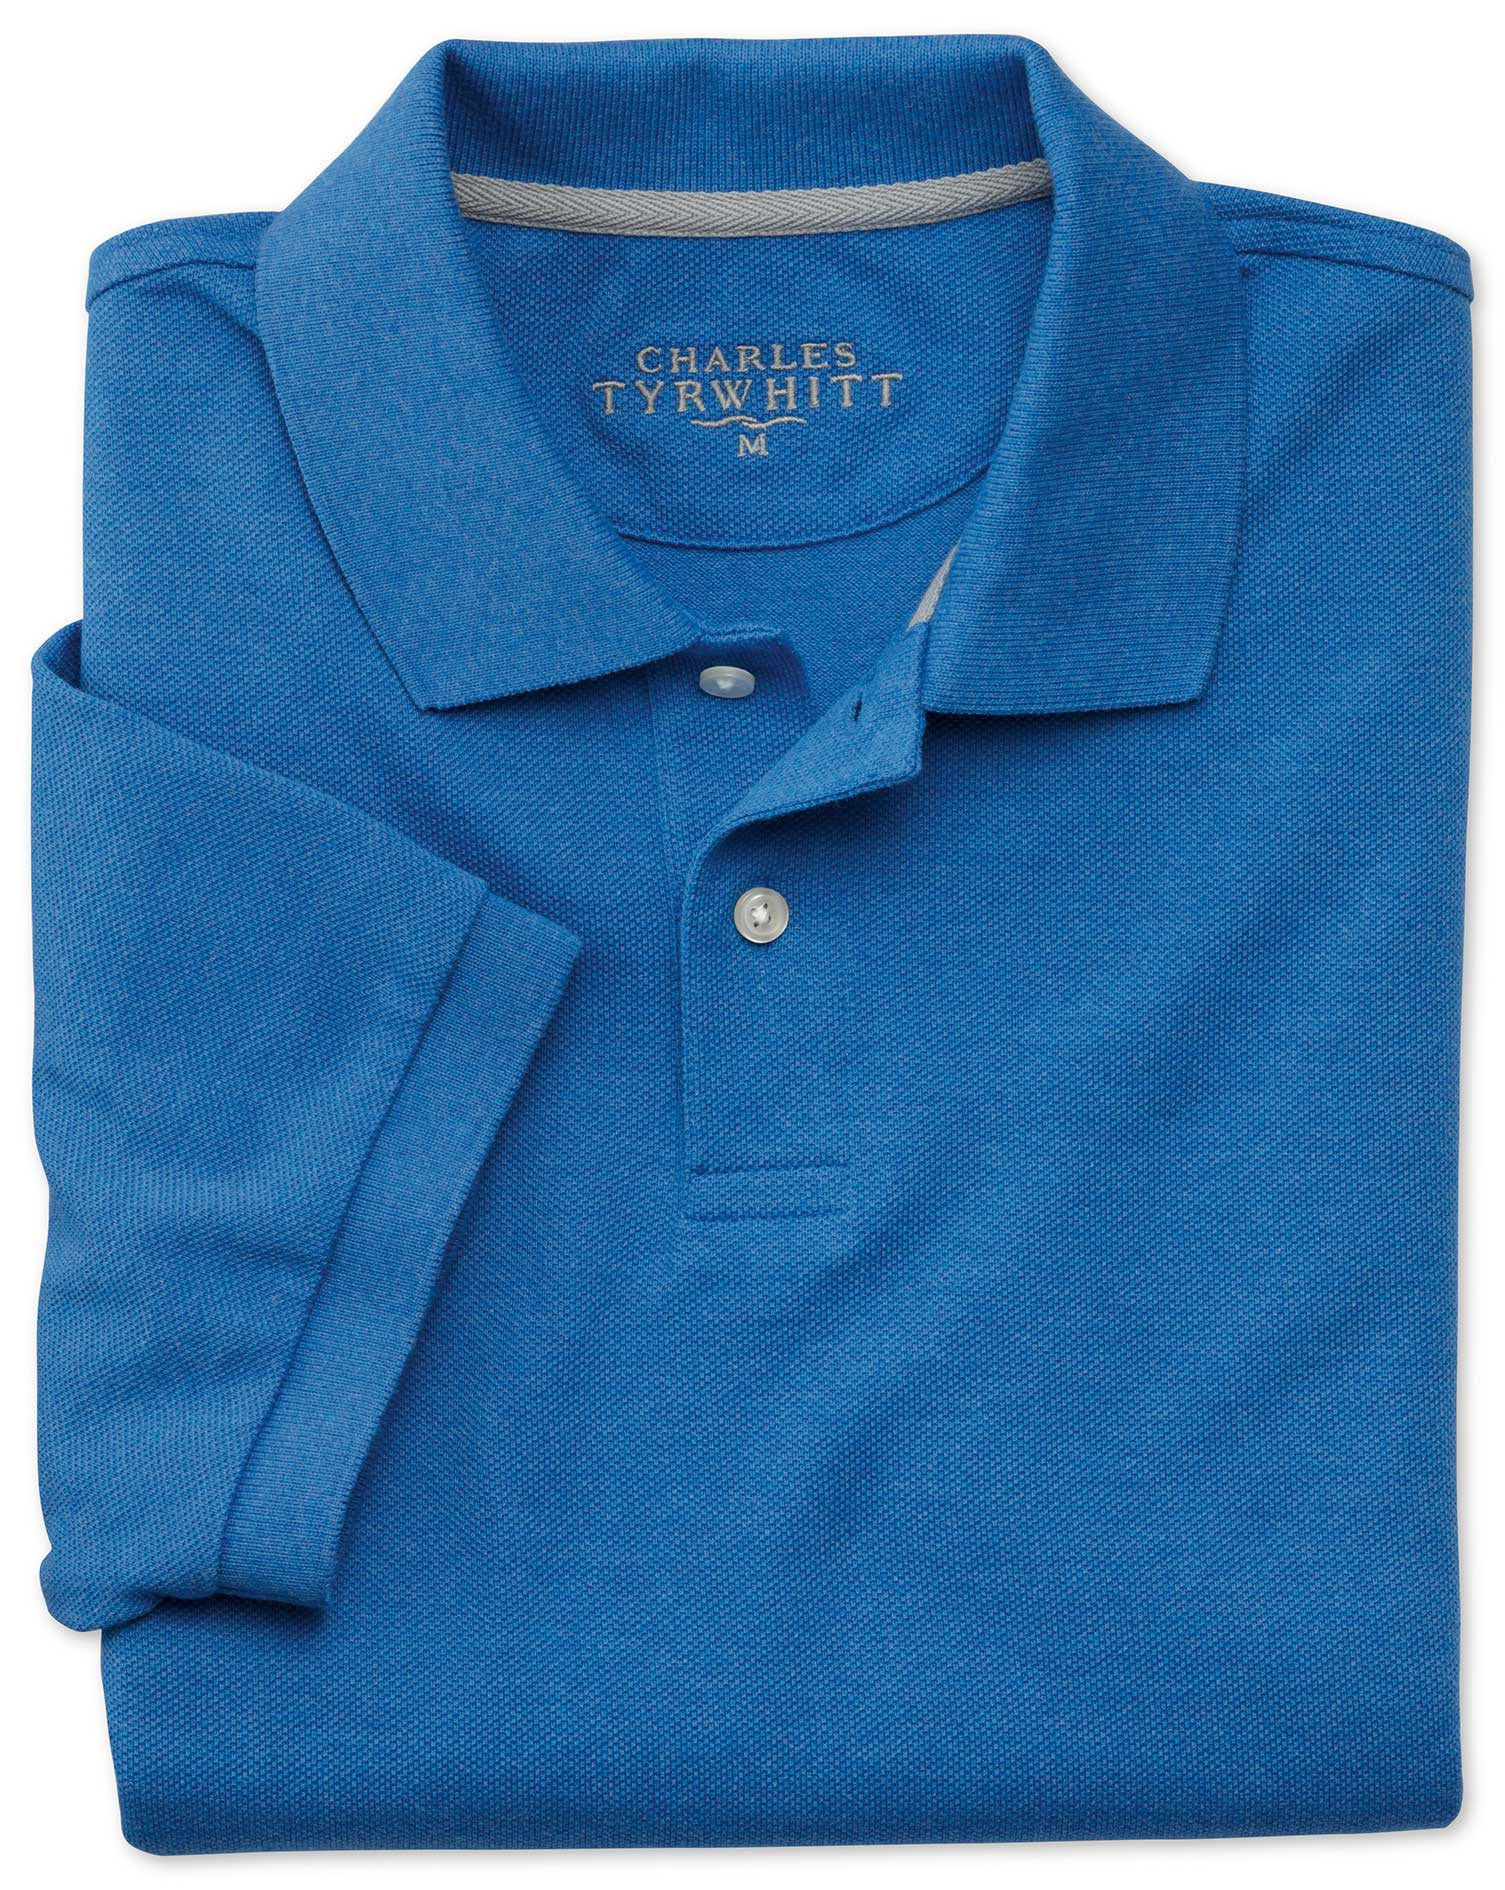 Blue Melange Pique Cotton Polo Size XS by Charles Tyrwhitt